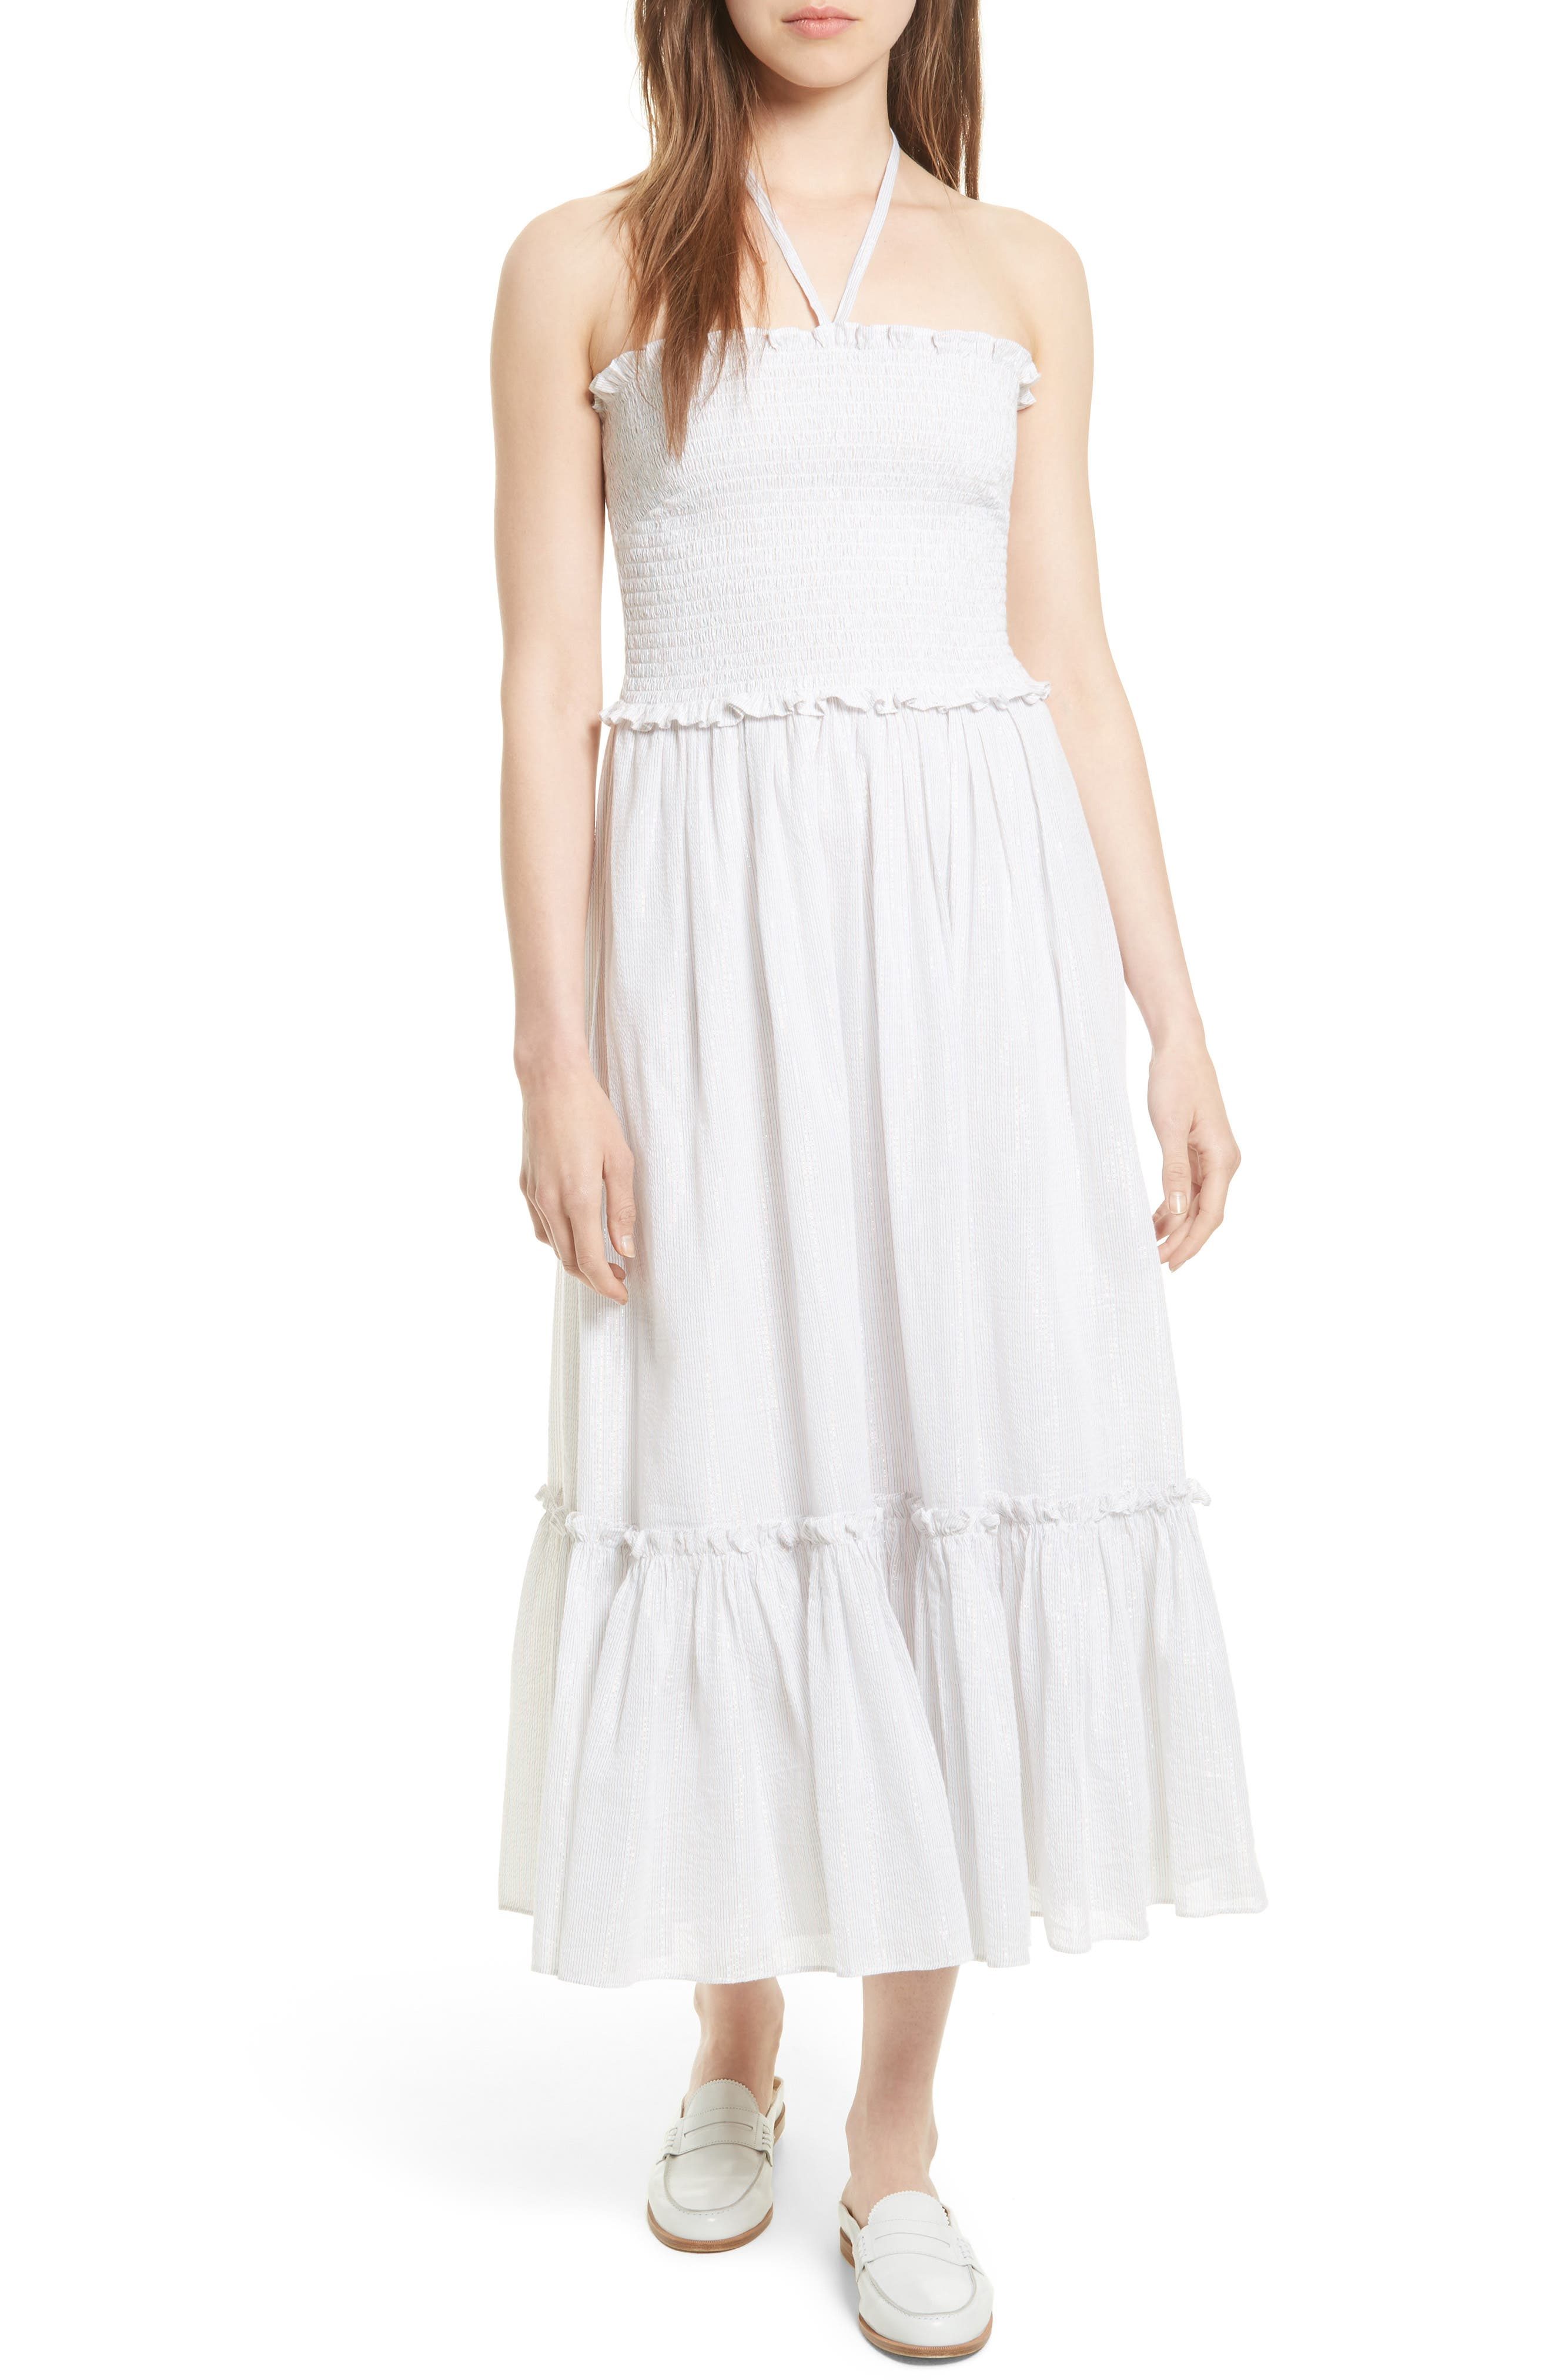 La Vie Rebecca Taylor Metallic Stripe Maxi Dress